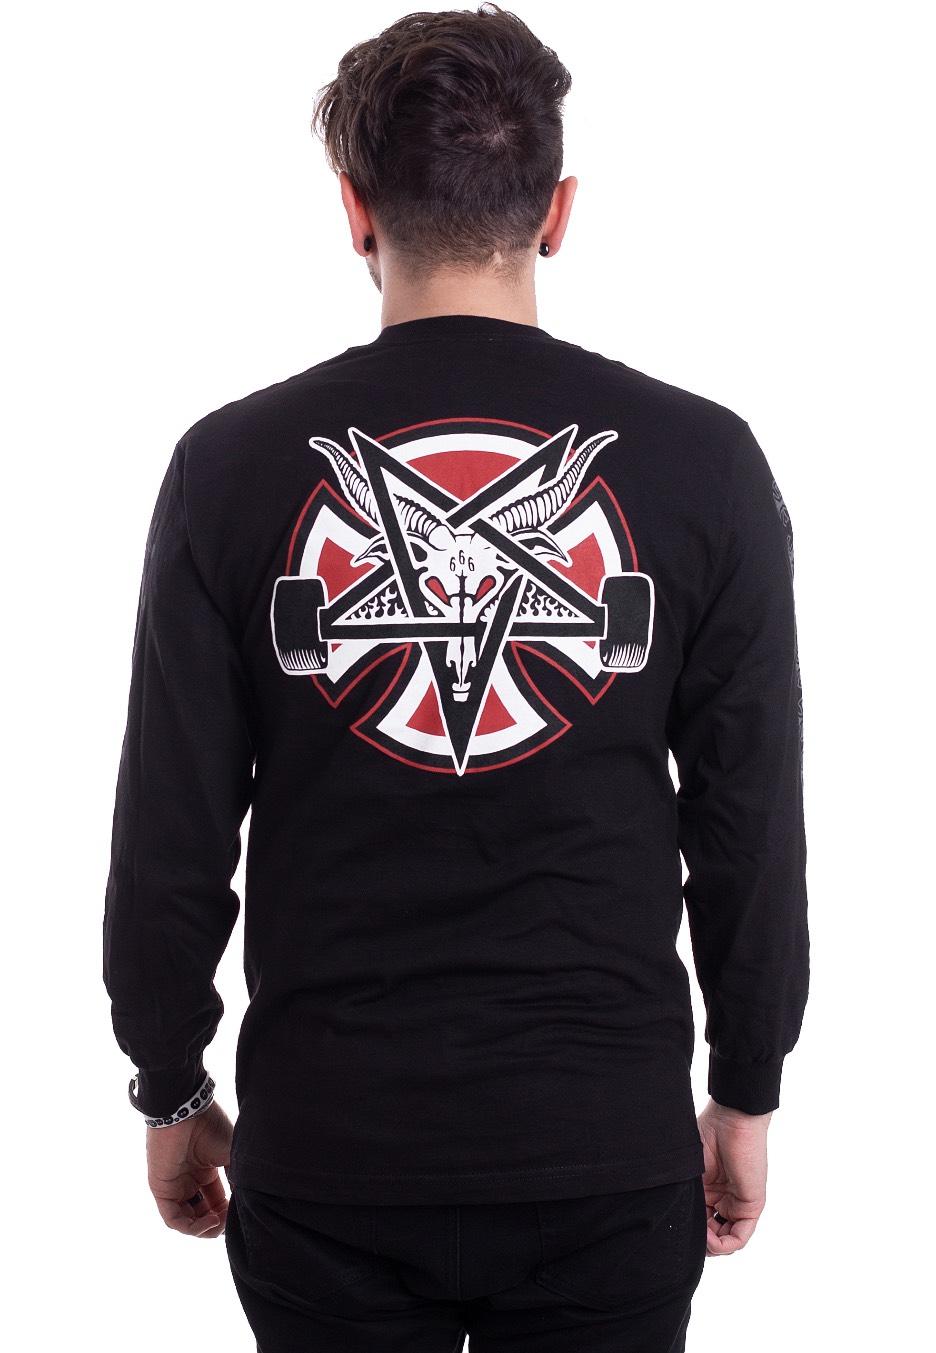 Pentagram Black Thrasher Independent Cross Tshirt X 7zwqHqTY